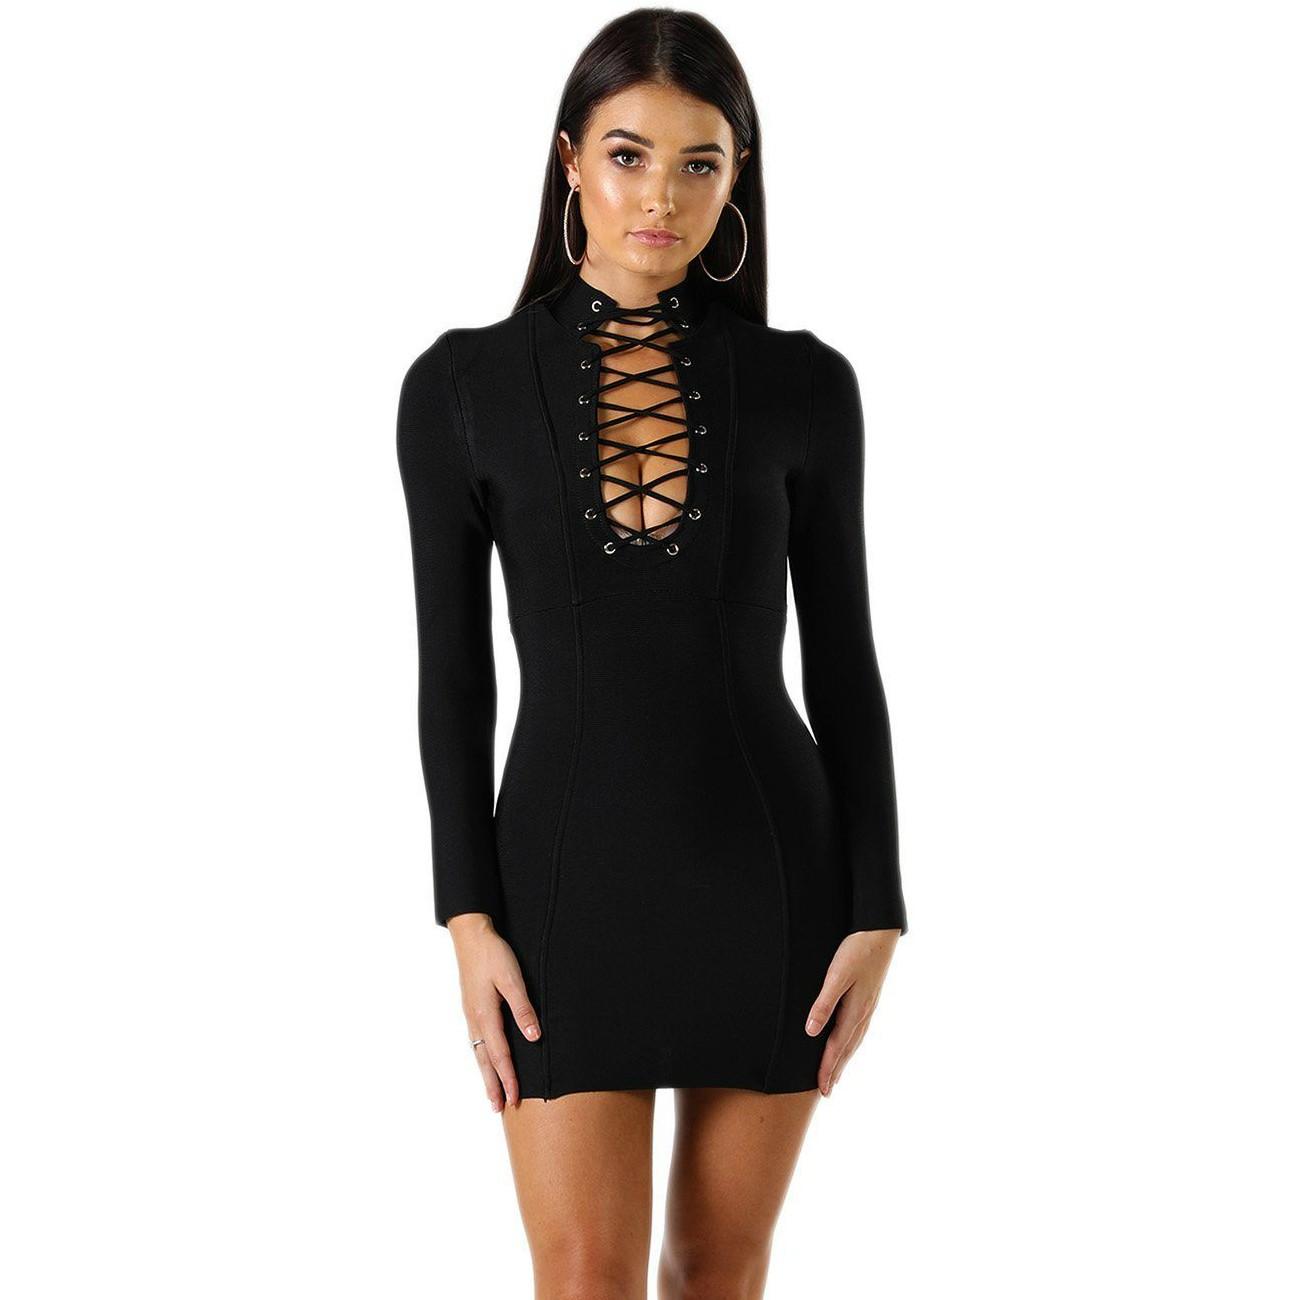 Black Halter Long Sleeve Mini Lace Up Fashion Bandage Dress HQ228-Black